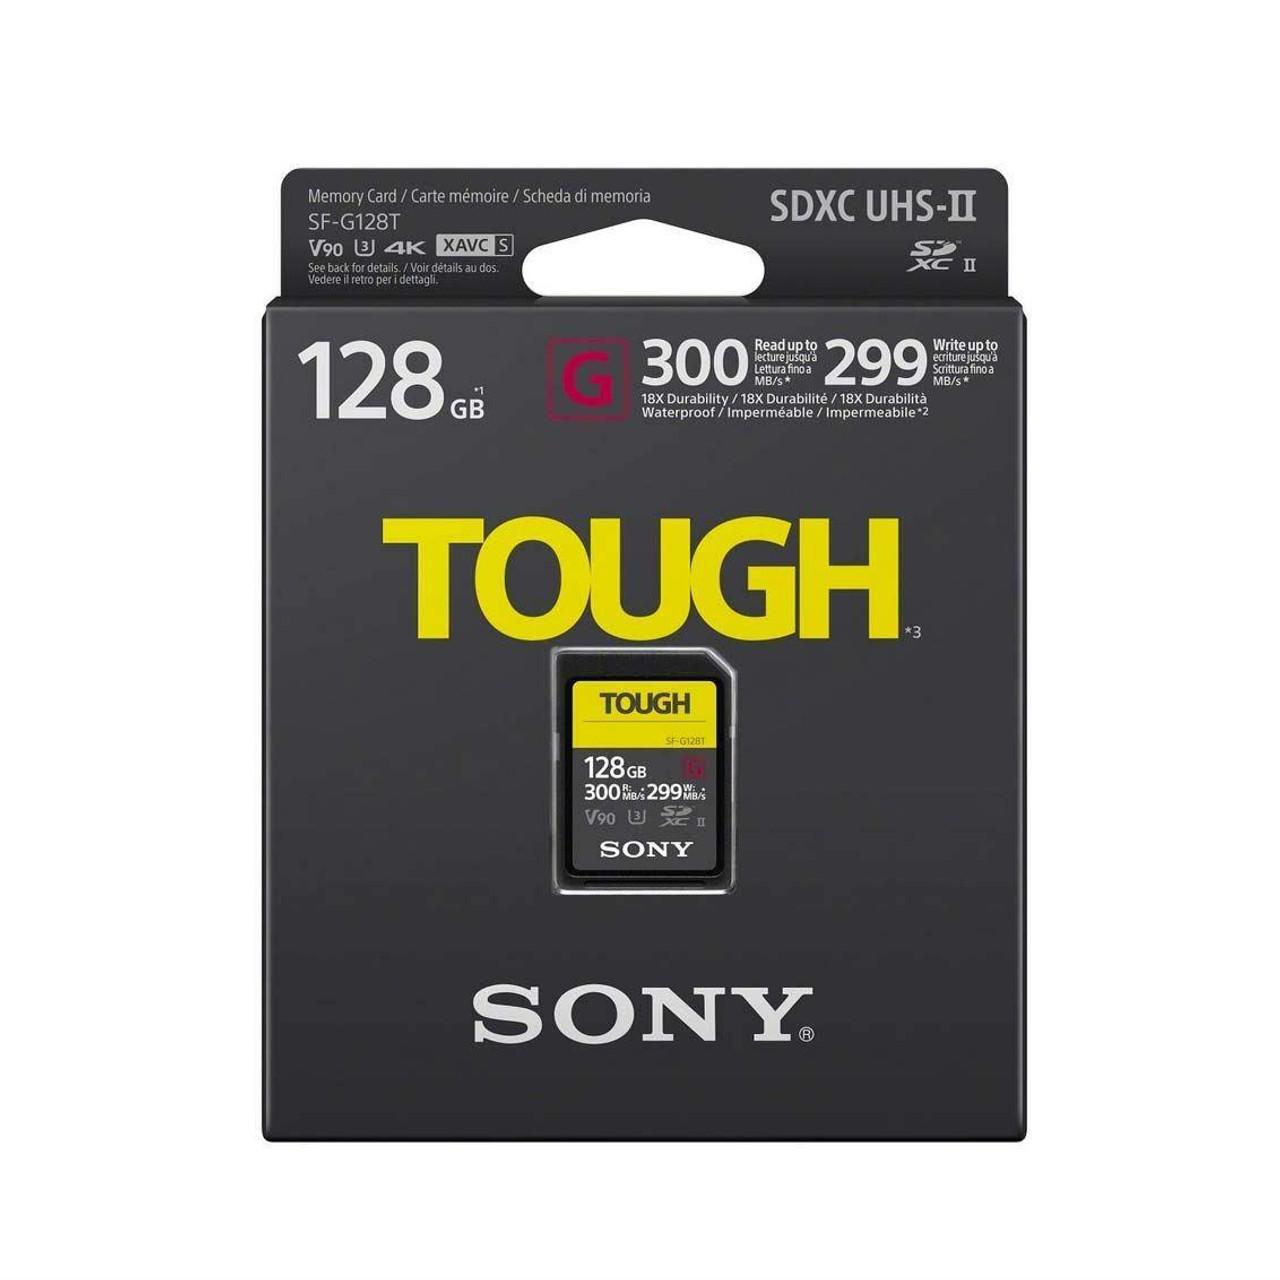 Sony 128GB G-Series Tough SDXC Card UHS-II, 300MB/s